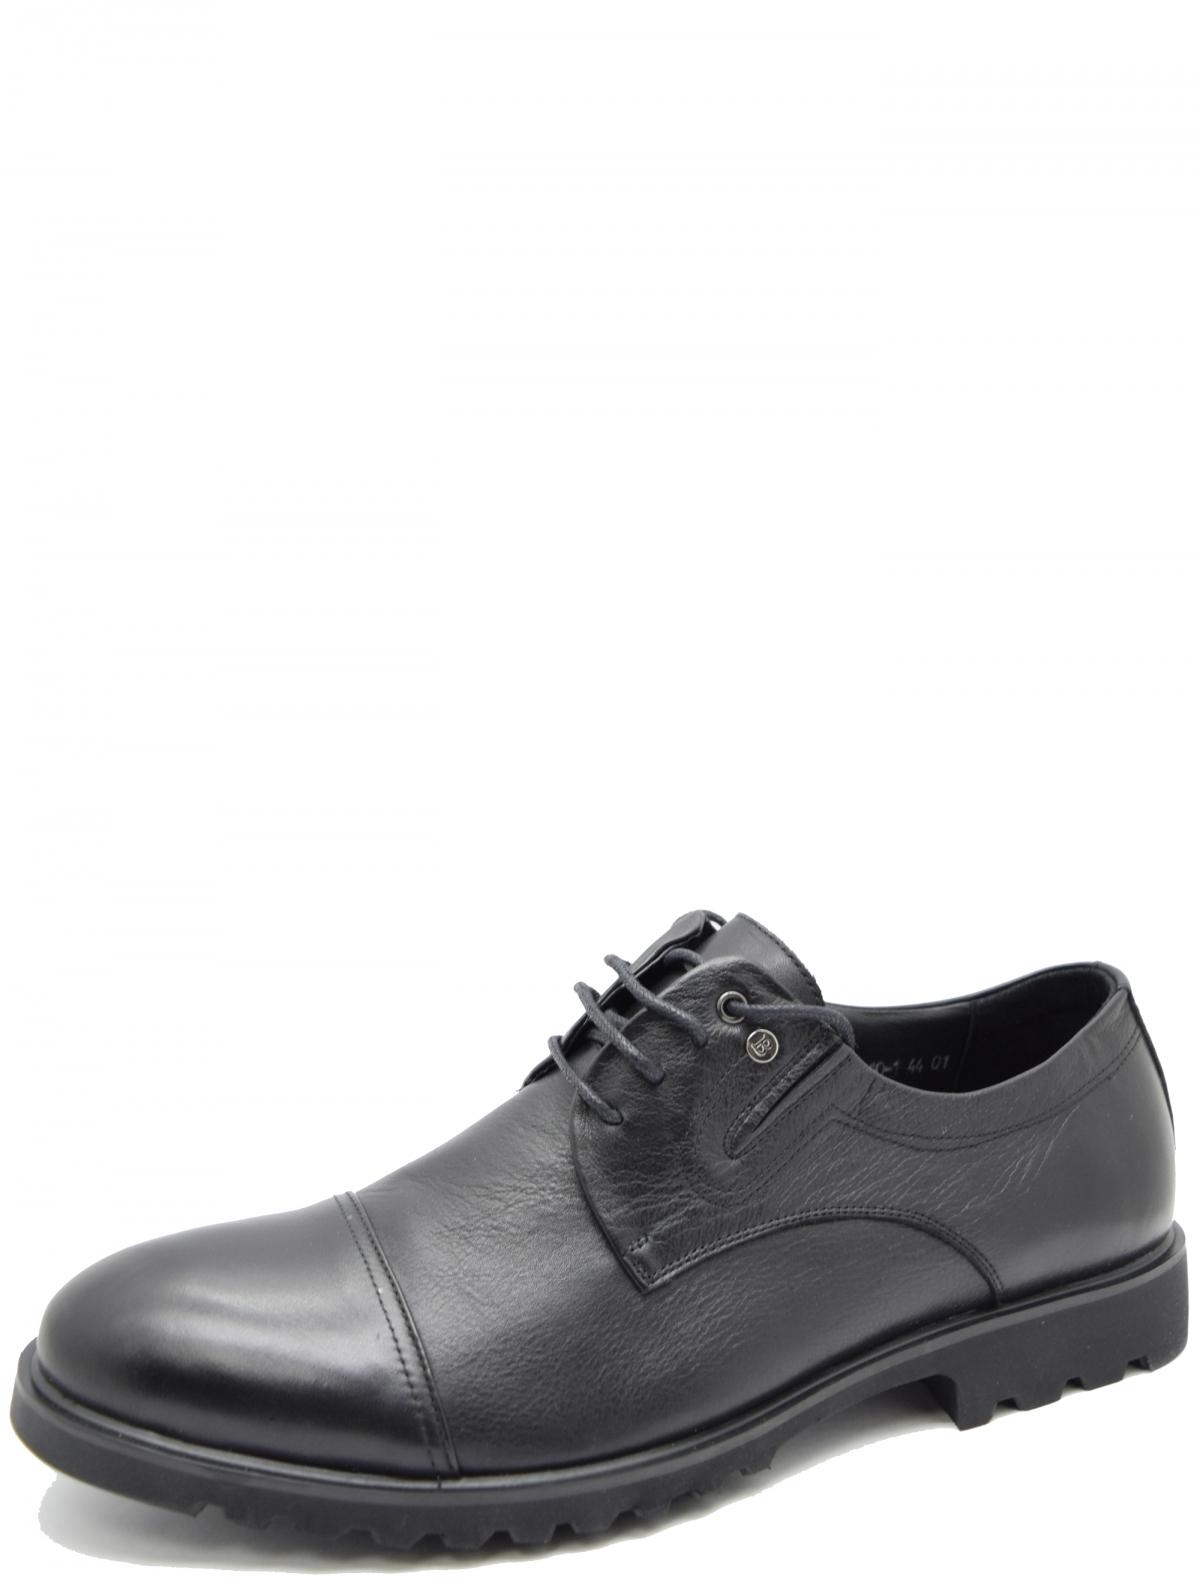 L3072-10-1 мужские туфли